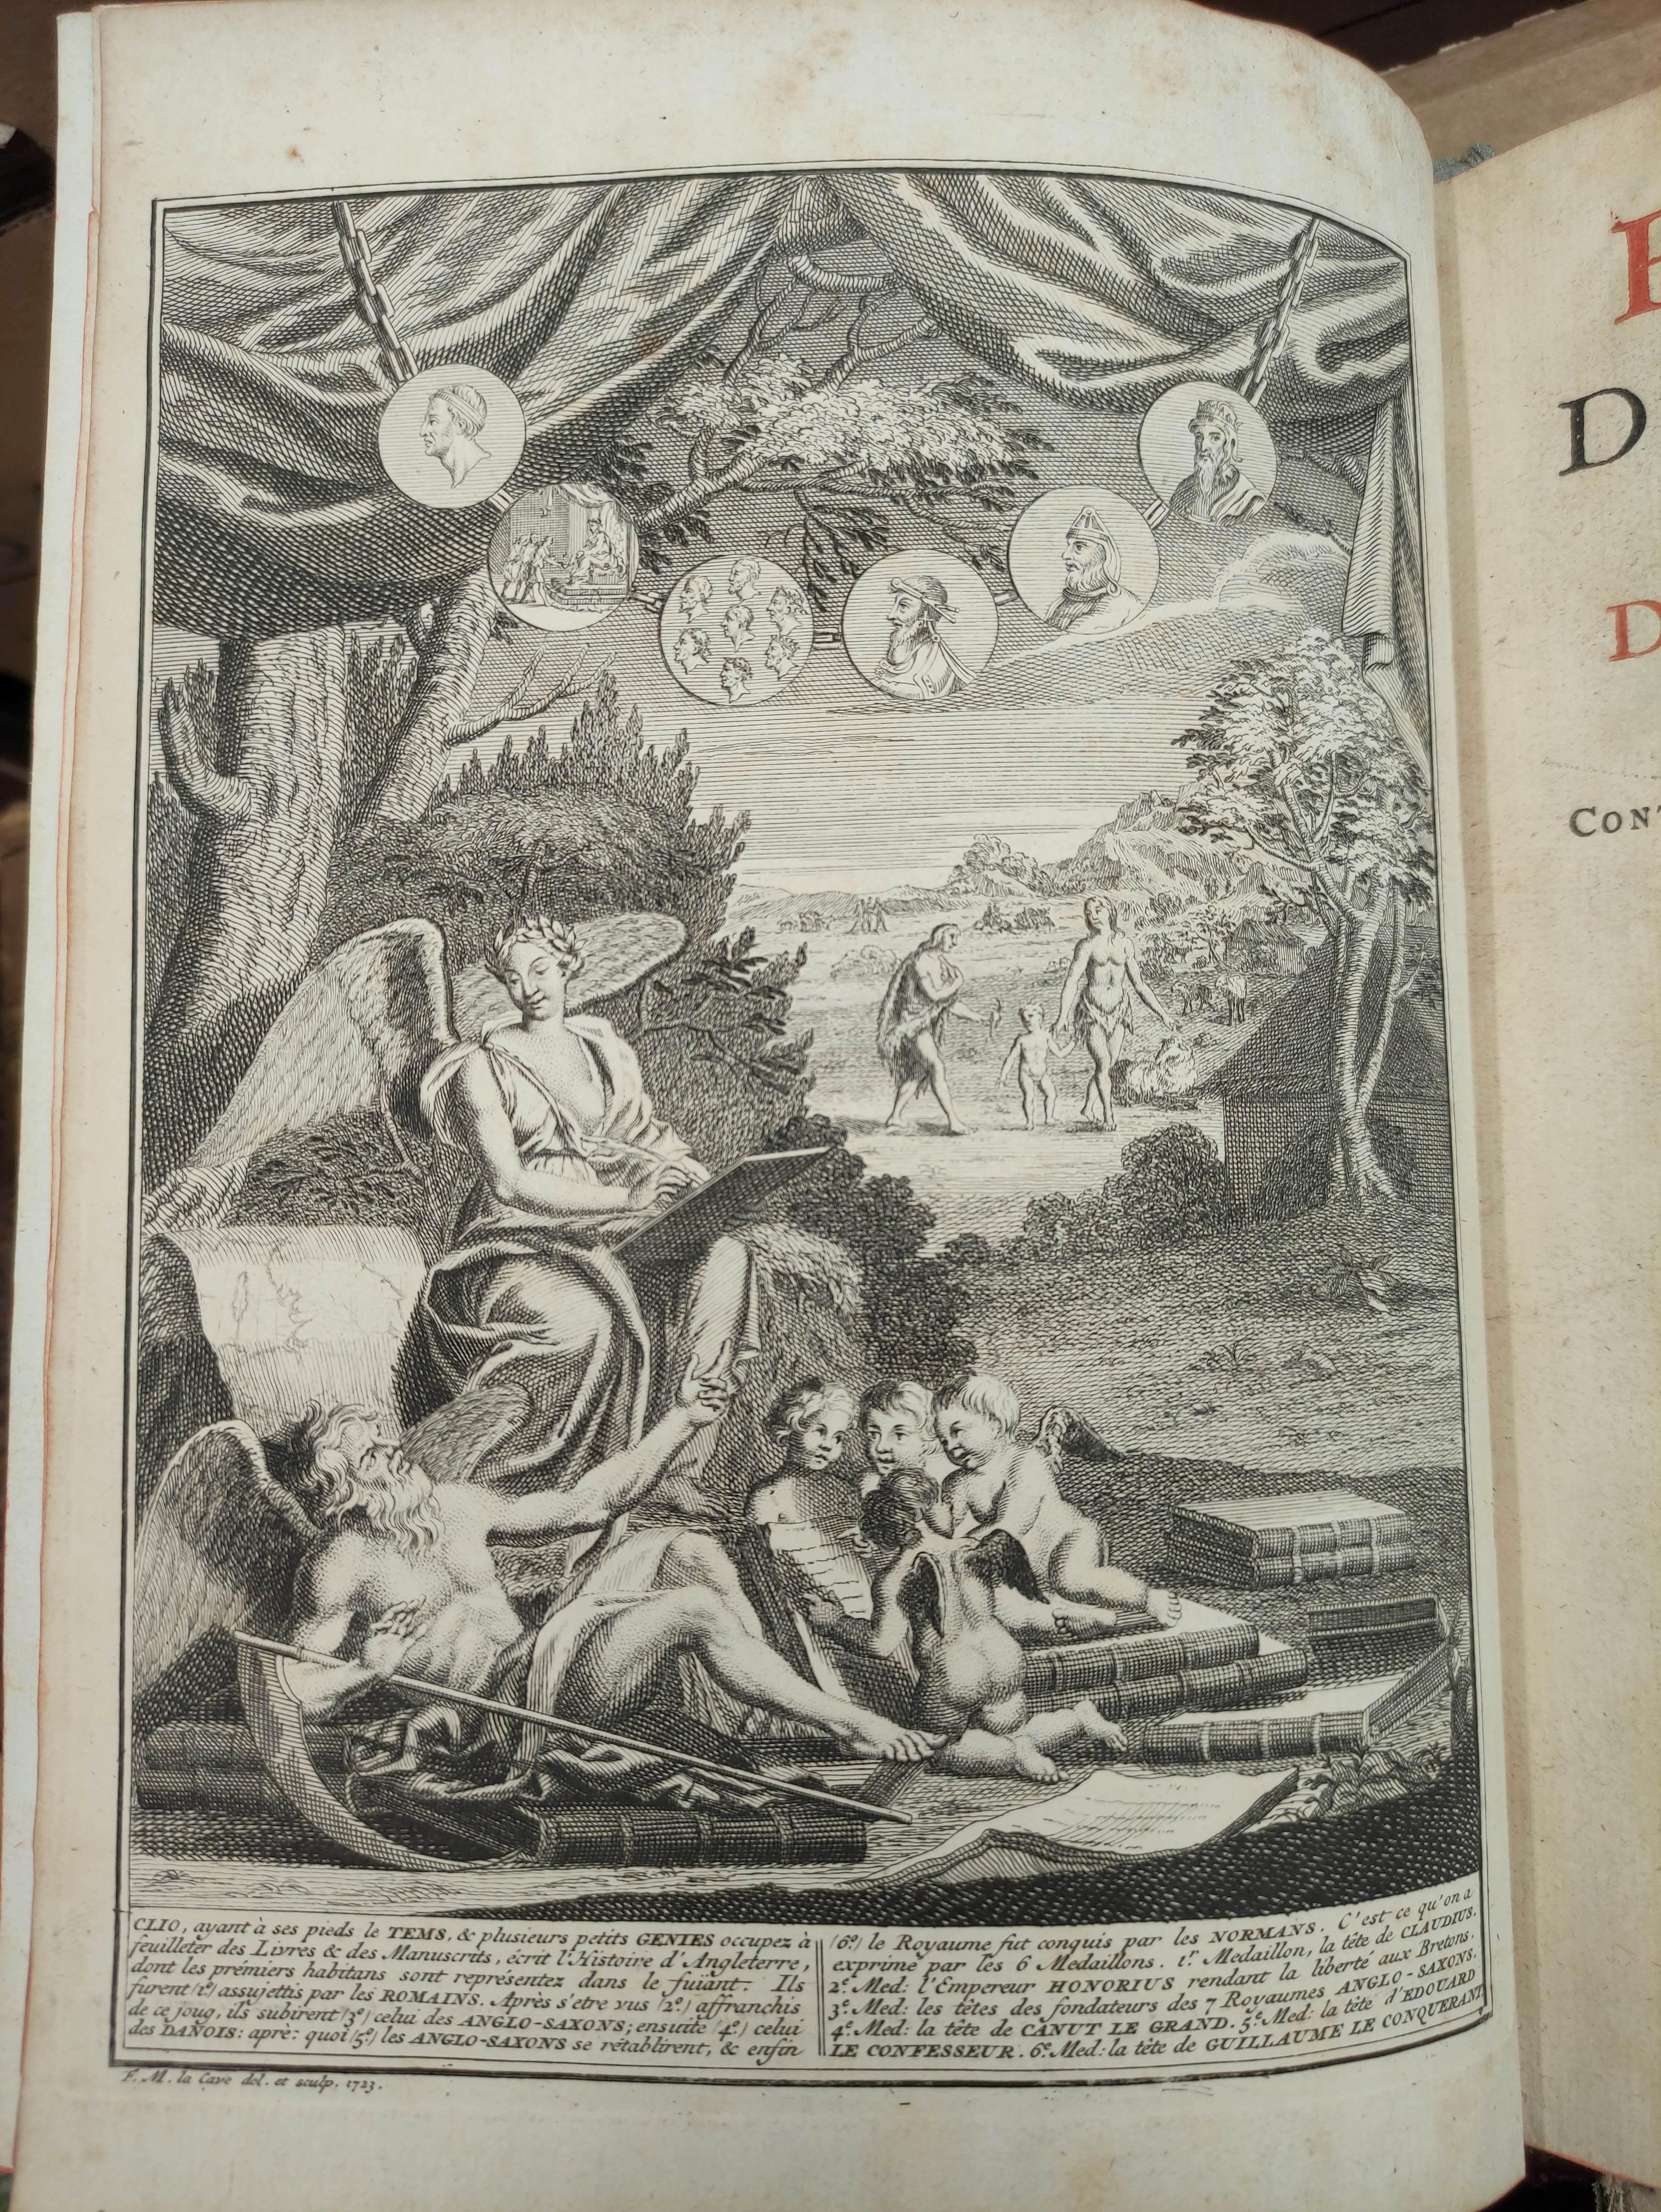 DE RAPIN THOYRAS.Histoire D'Angleterre. 10 vols. Eng. plates, fldg. tables, etc. Quarto. Calf. The - Image 5 of 8